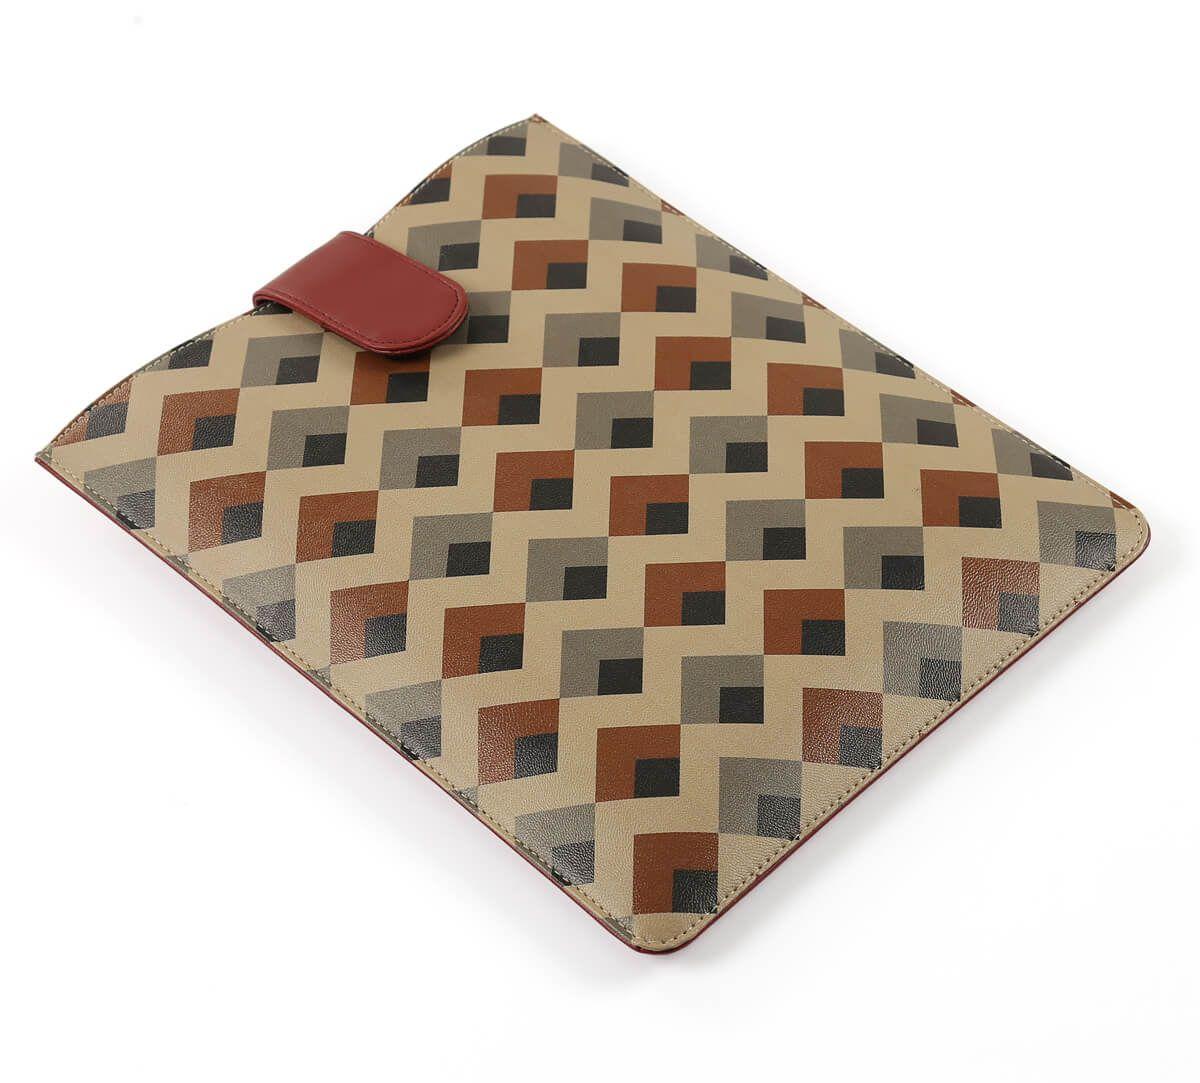 India Circus Tiled Penduncle iPad Sleeve